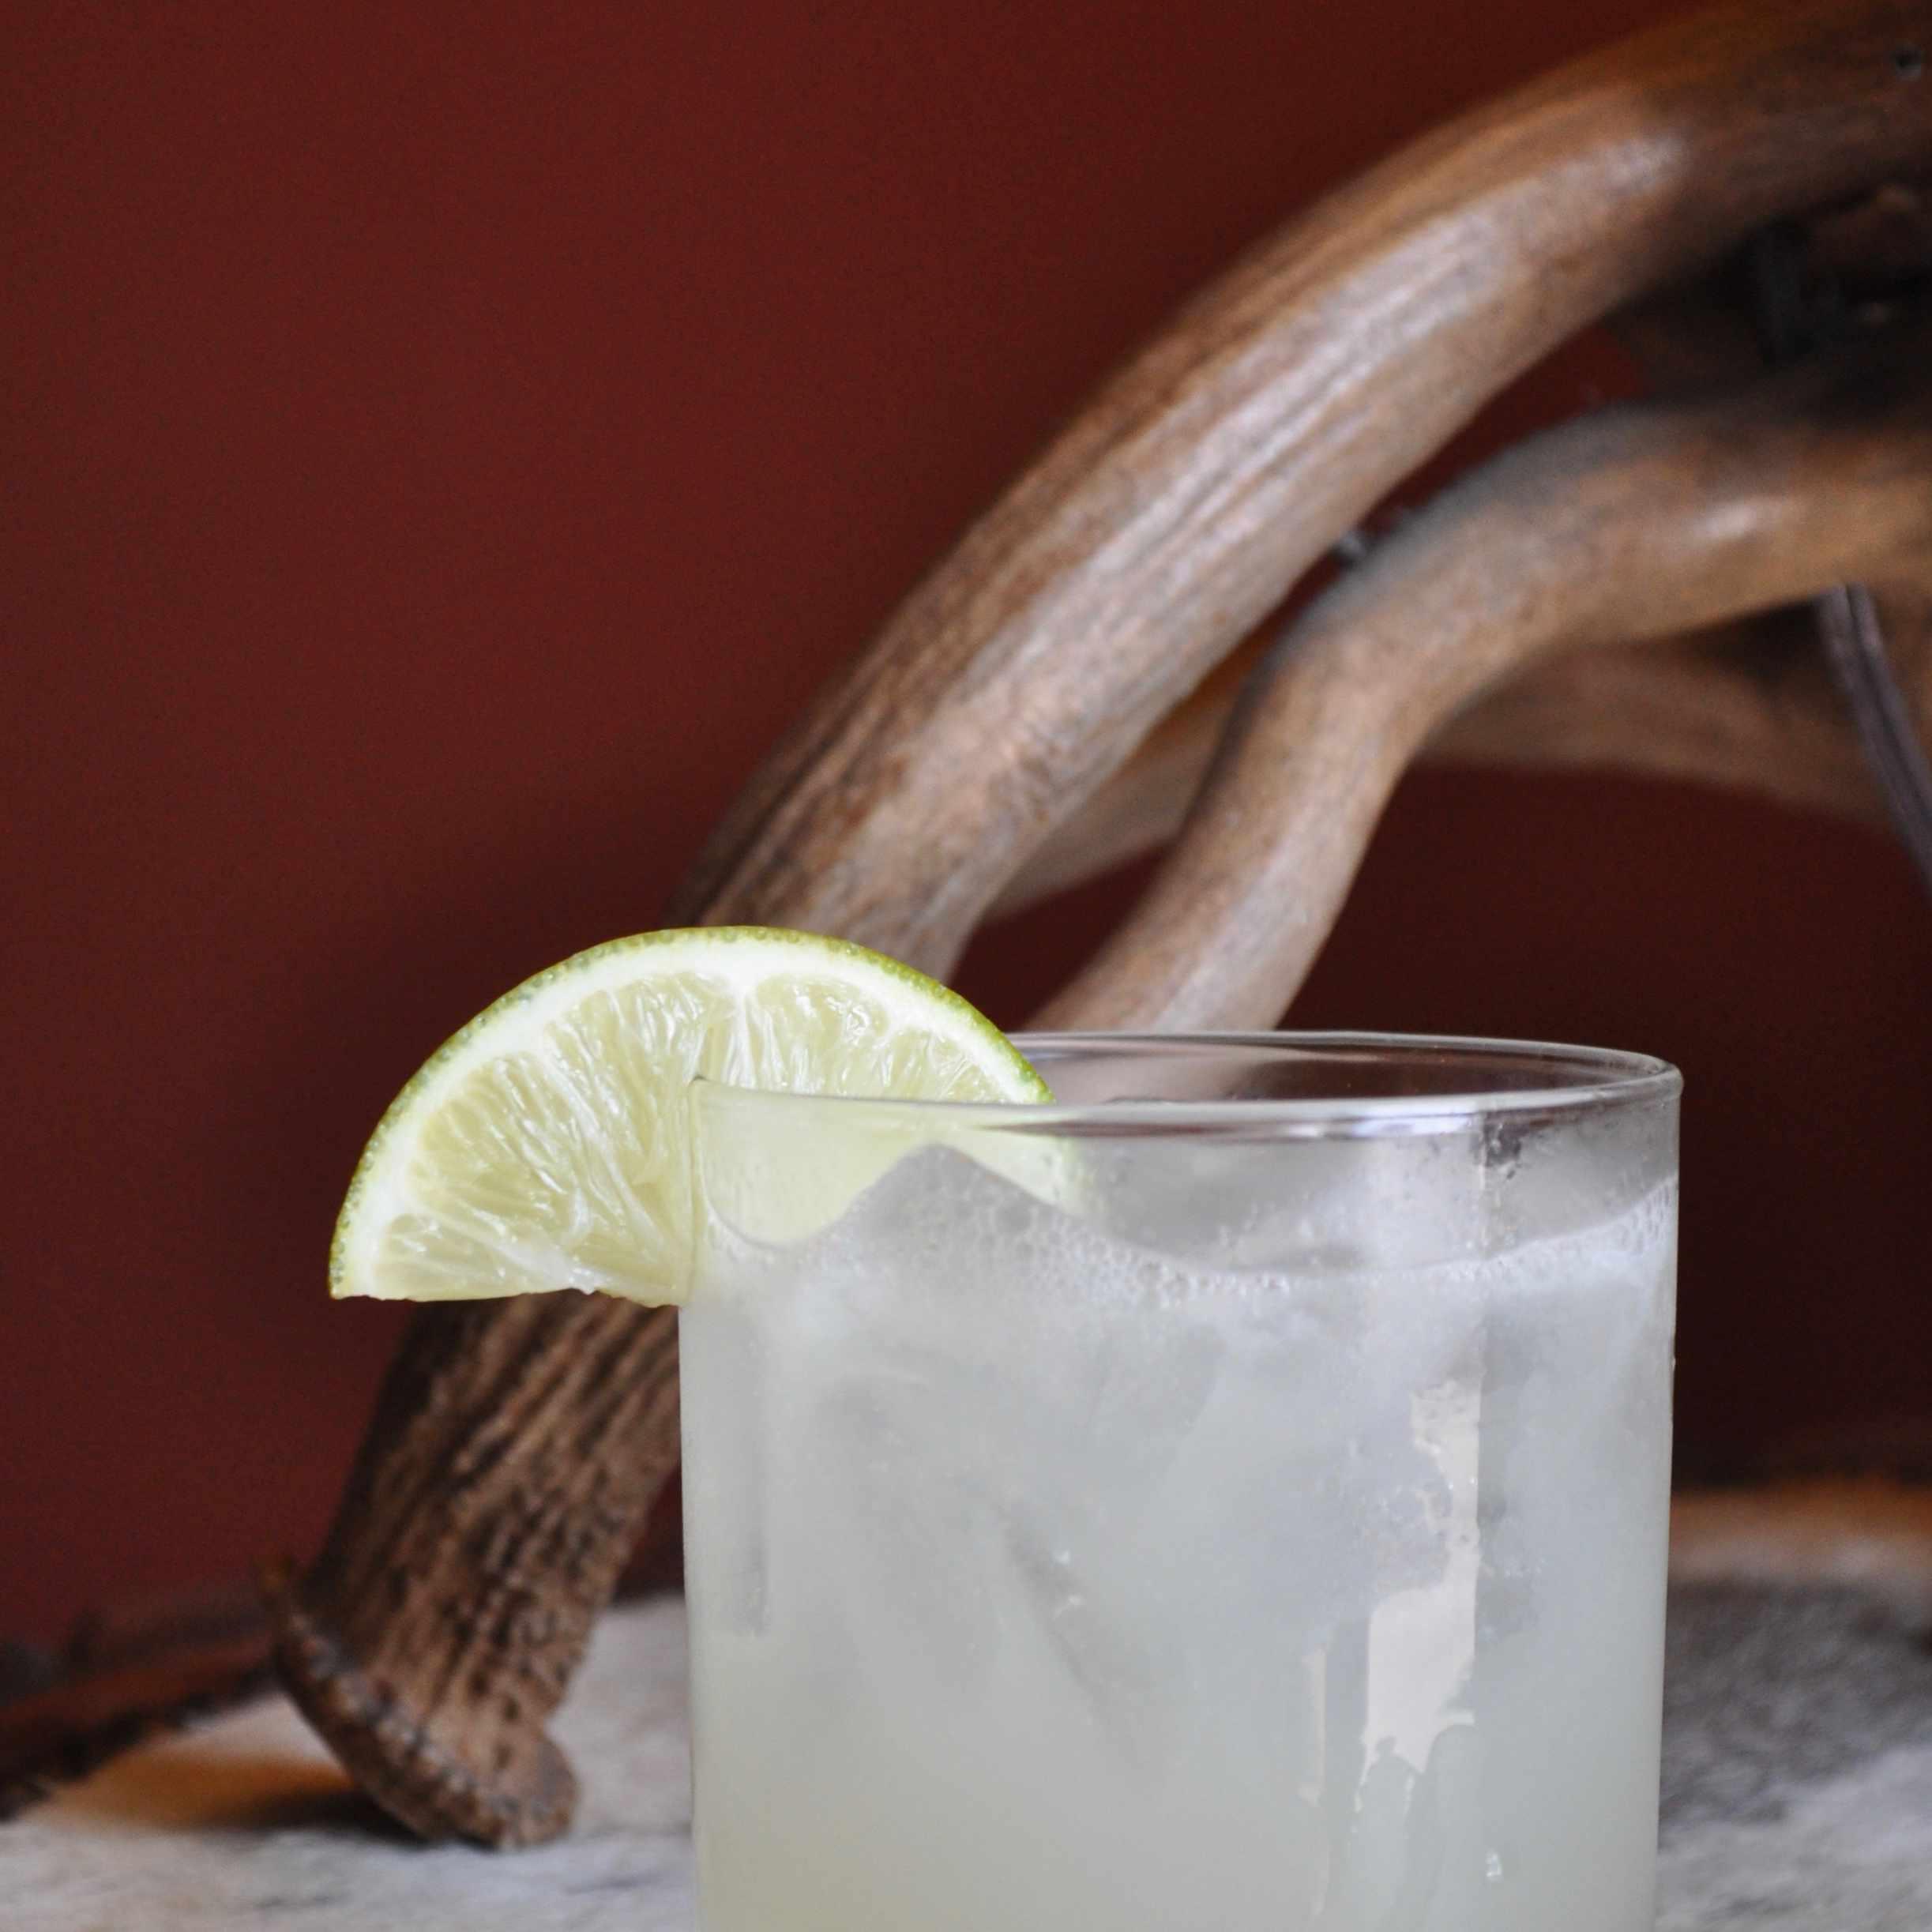 Gill's Margarita at Maudie's